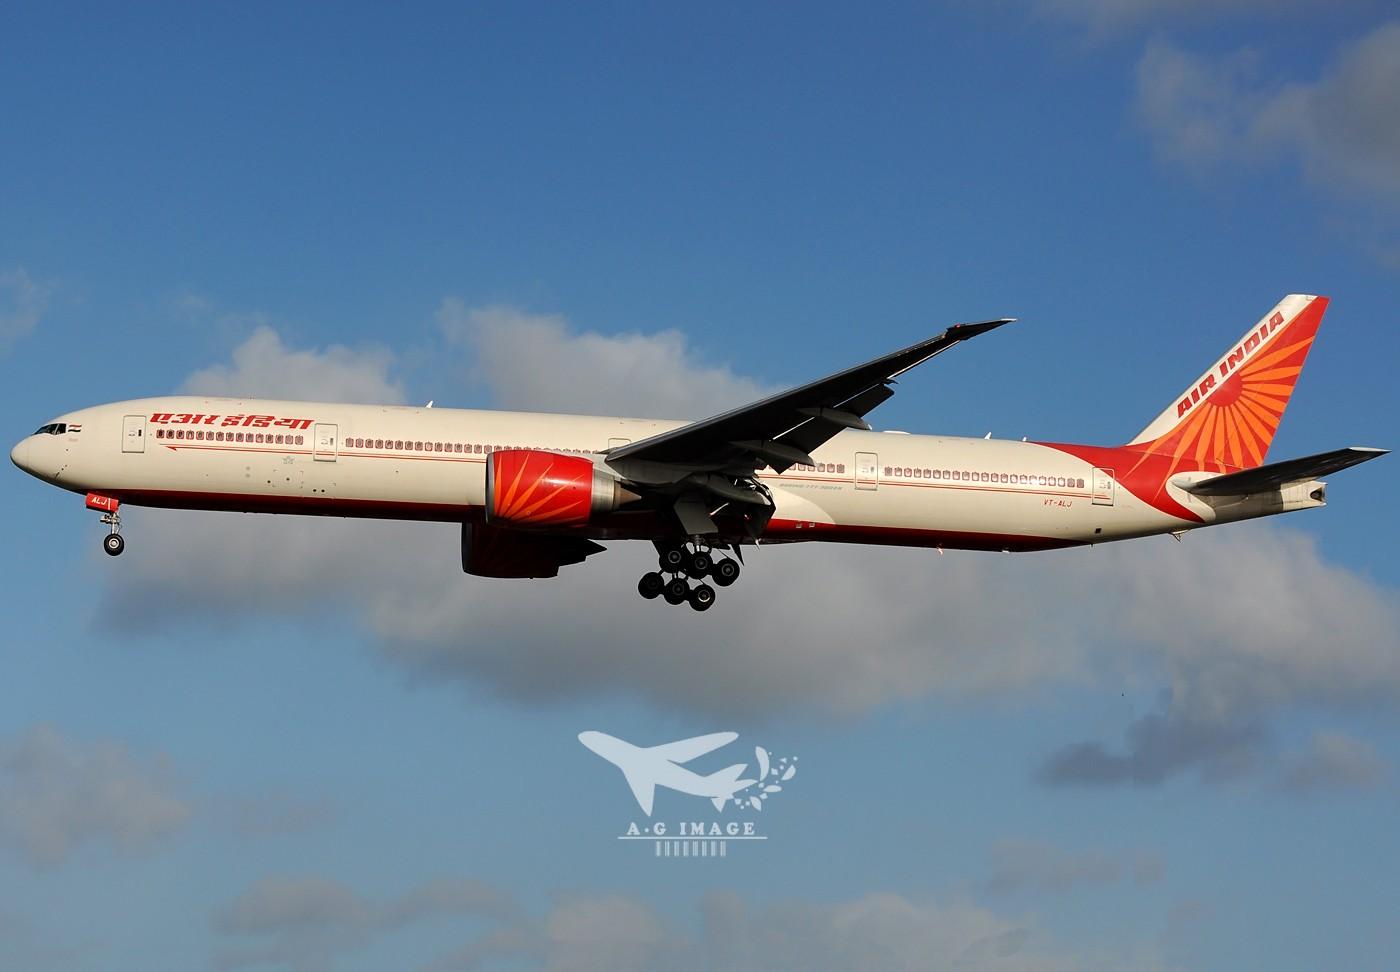 Re:[原创]【七彩天空】--八张来自LHR的77w大图,看到血脉喷张! BOEING 777-300 VT-ALJ 英国伦敦希思罗机场